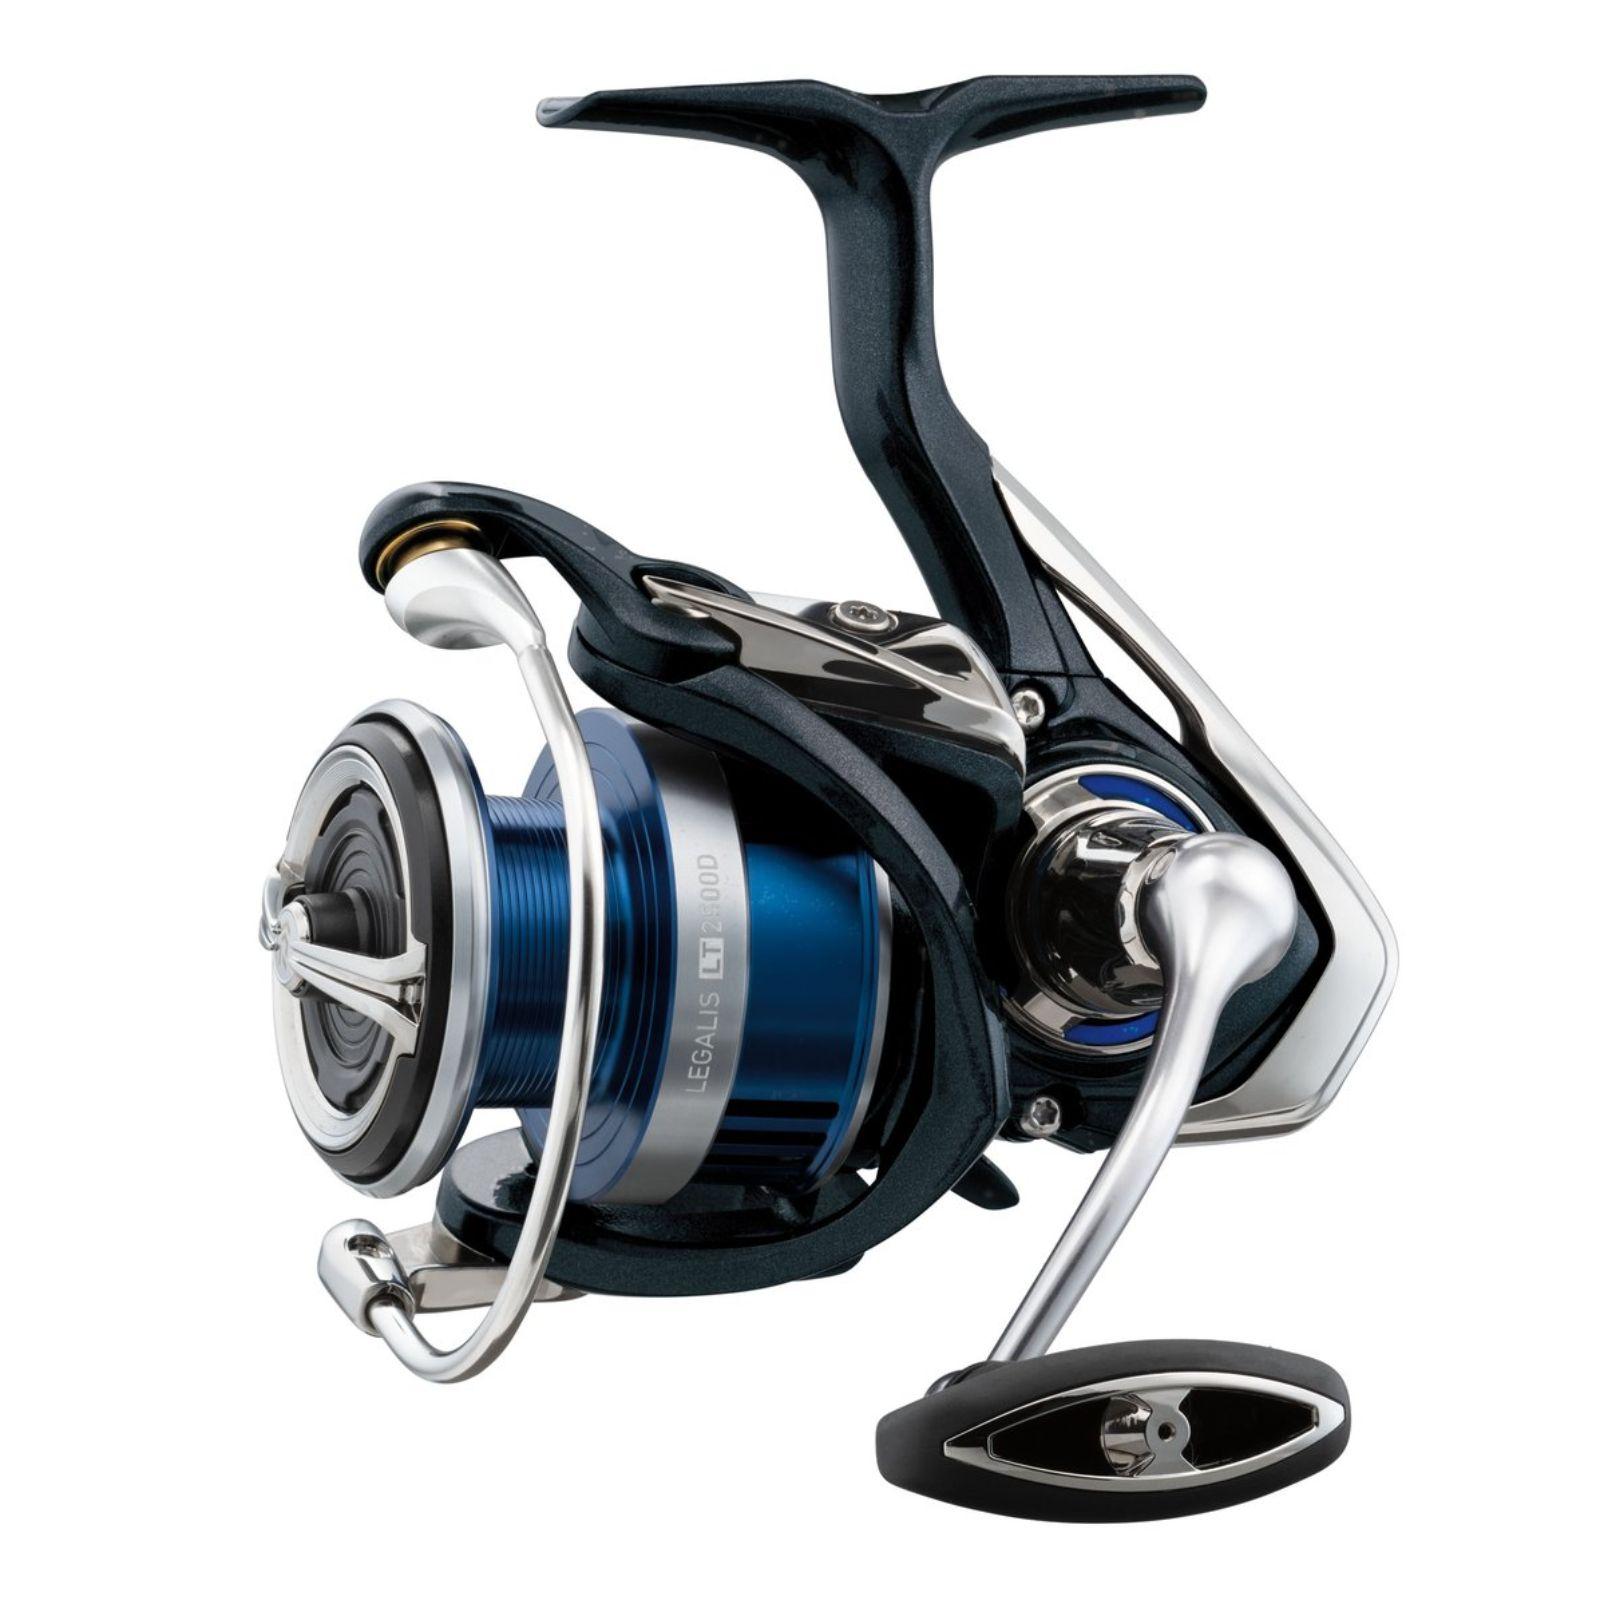 Daiwa Legalis LT 1000D Spinning Reel